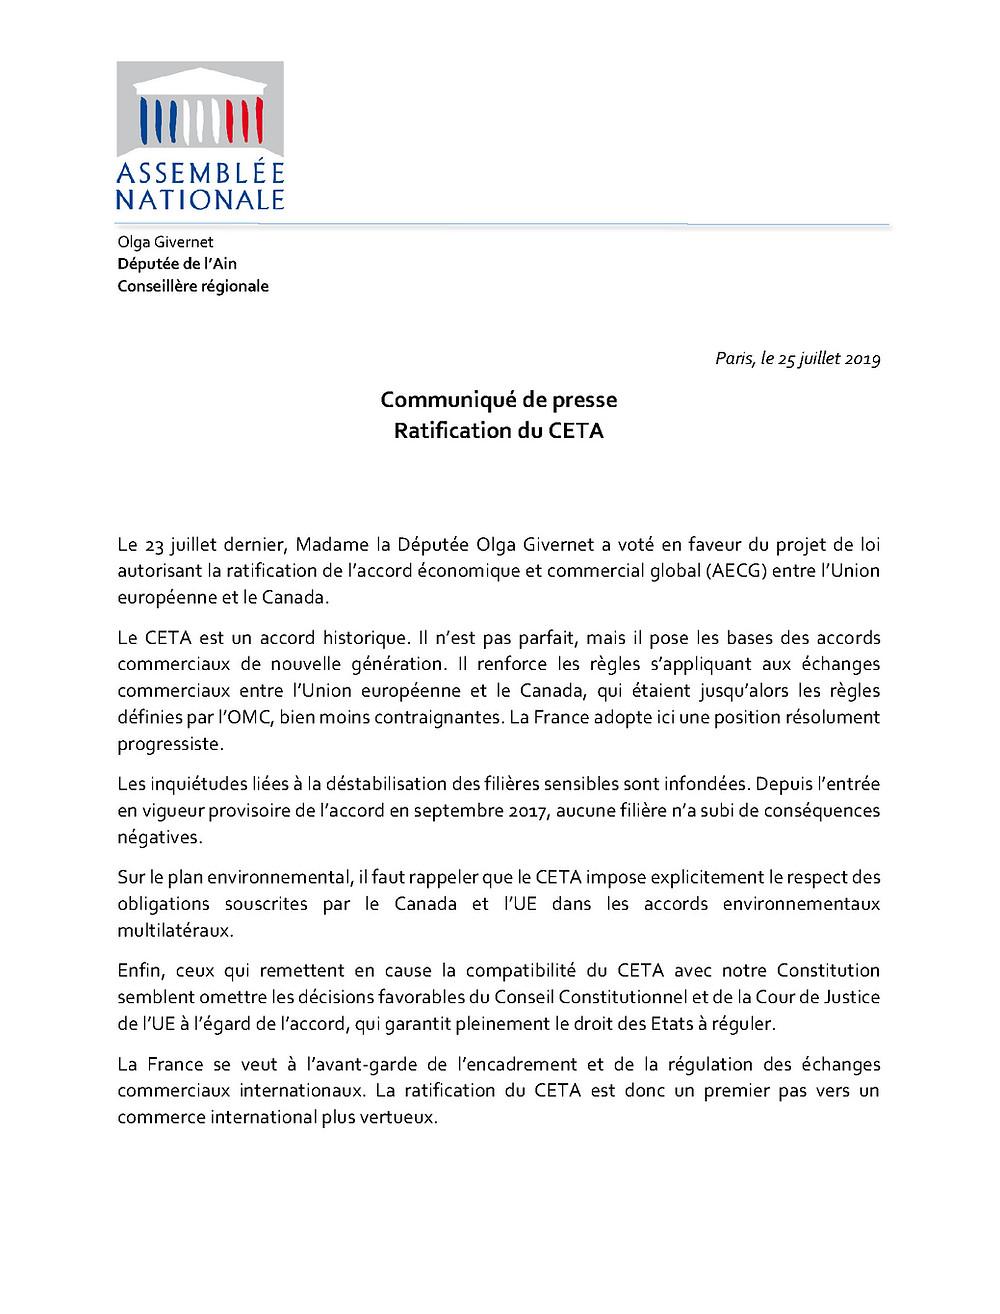 CP Ratification du CETA